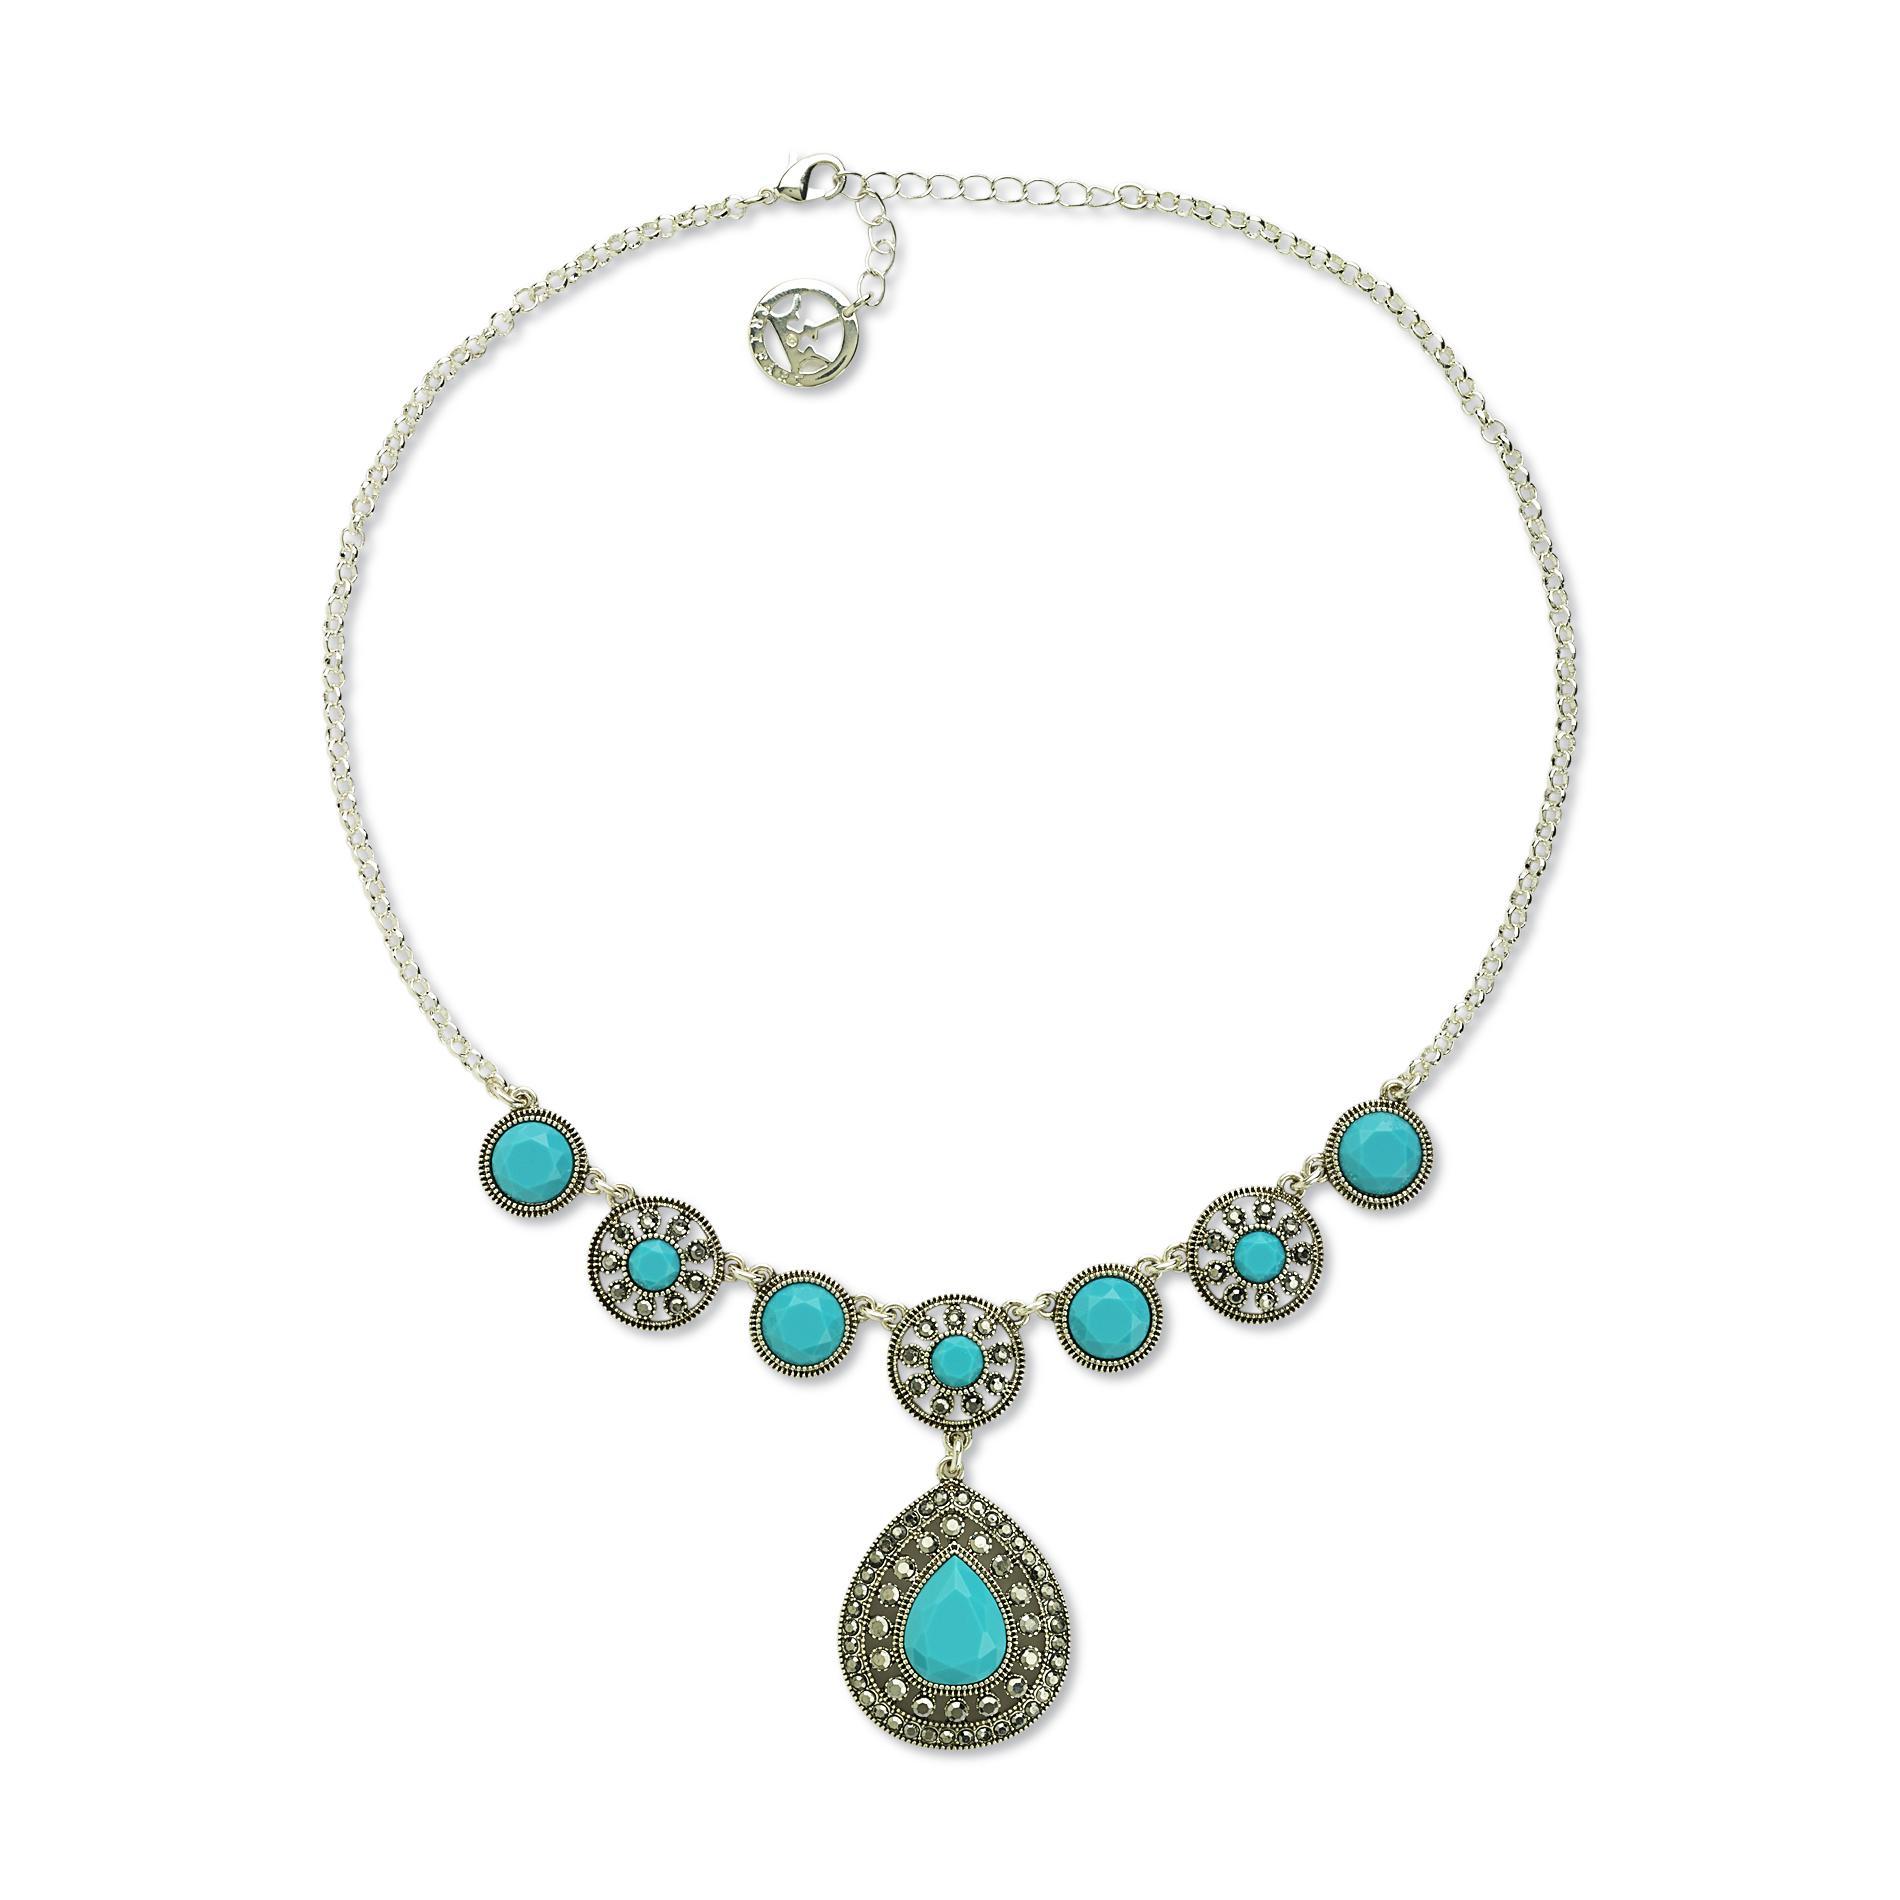 Trifari Women's Silvertone Imitation Turquoise Y-Necklace